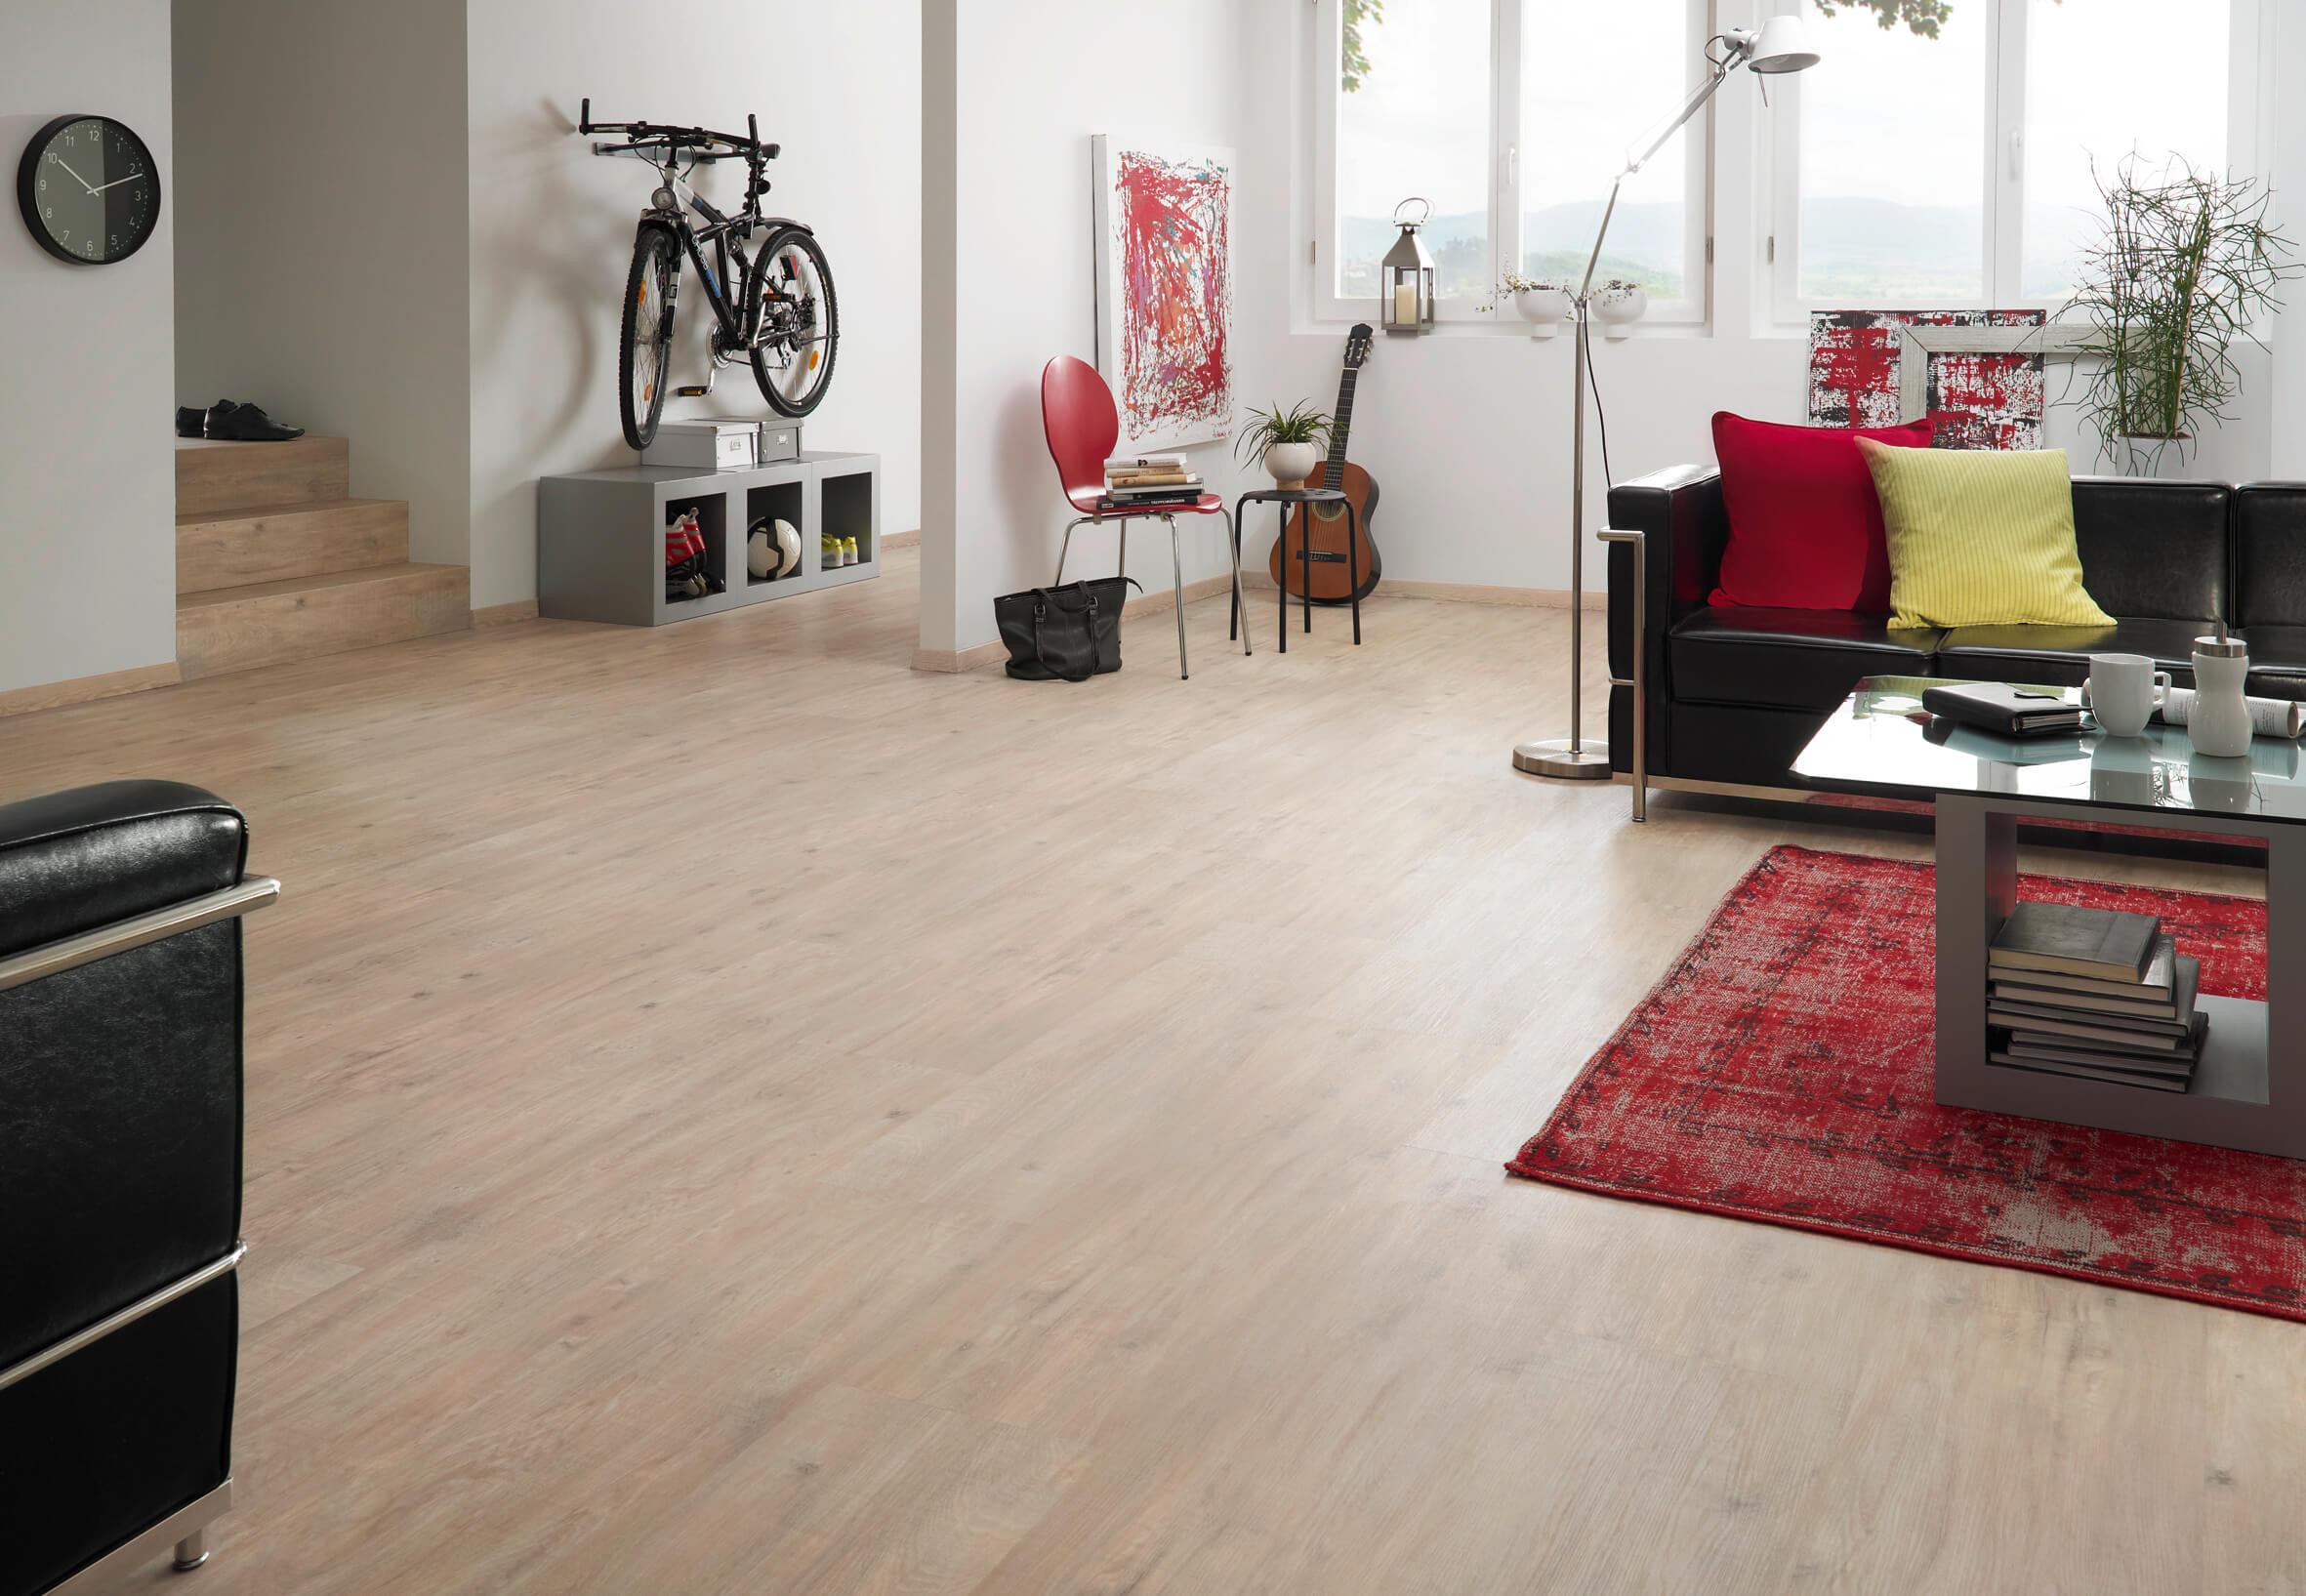 sandeiche antigua professional kwg vinylboden 10 mm. Black Bedroom Furniture Sets. Home Design Ideas